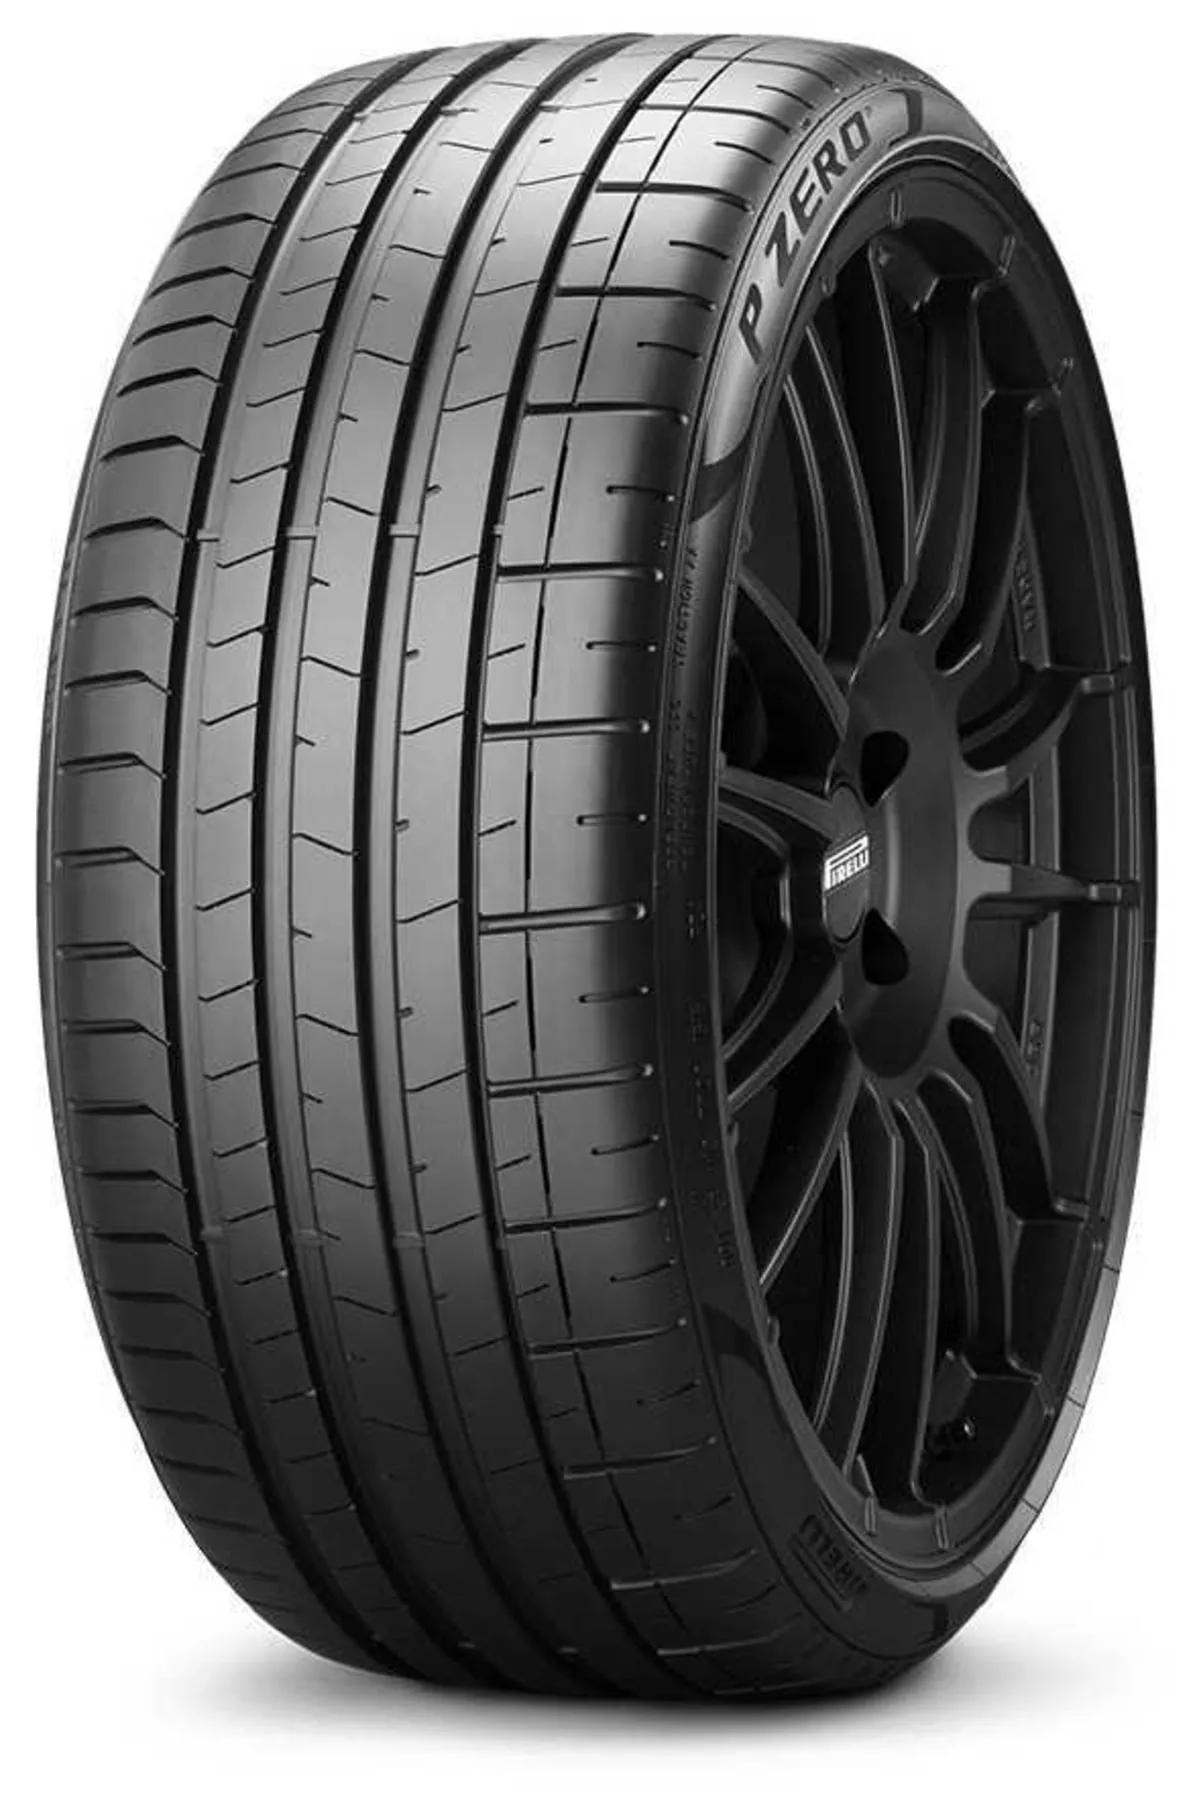 Pirelli 275/40R20 106W P-Zero BMW (*) Runflat L.S. (2017) Fiyatları